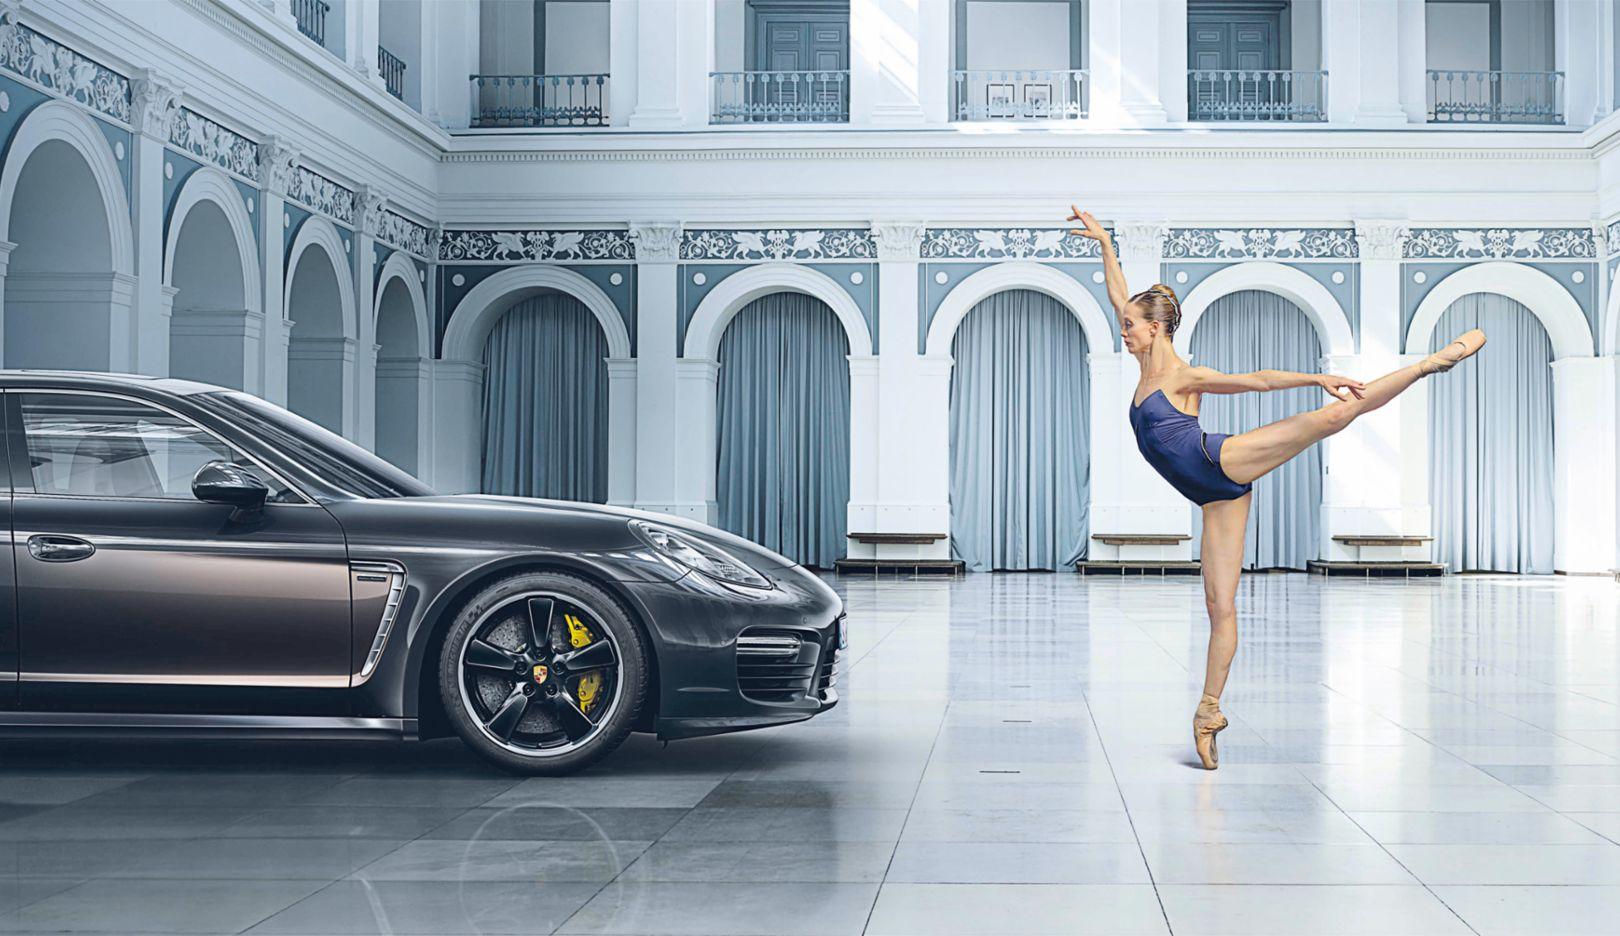 Anzeigenmotiv, Ballerina Alicia Amatriain, Panamera Turbo S Exclusive Series, Porsche AG